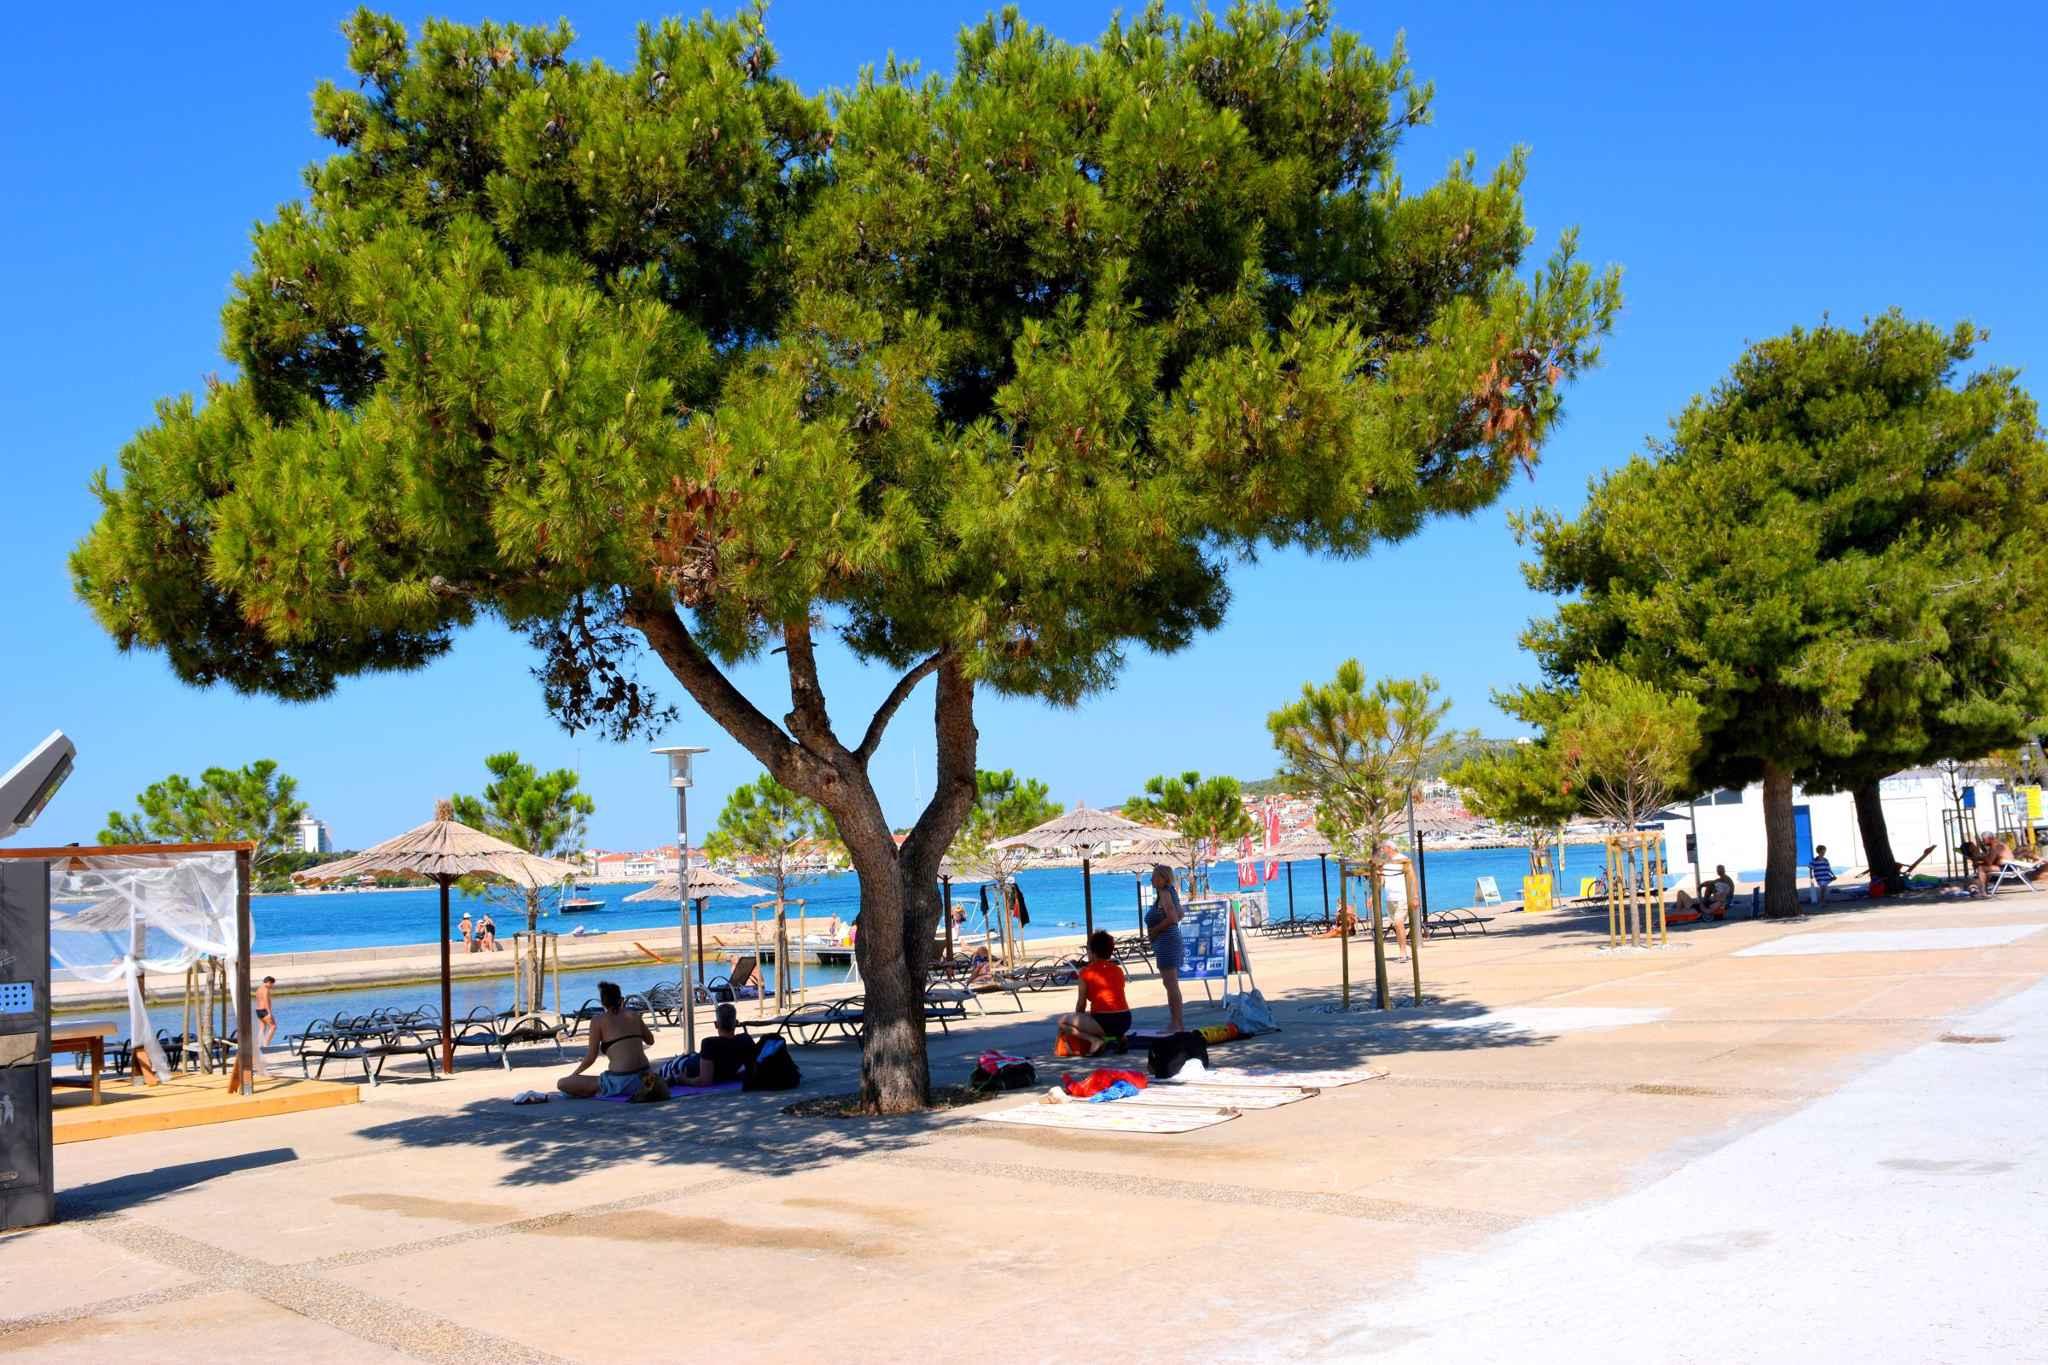 Appartement de vacances mit Terrasse (278775), Vodice, , Dalmatie, Croatie, image 8